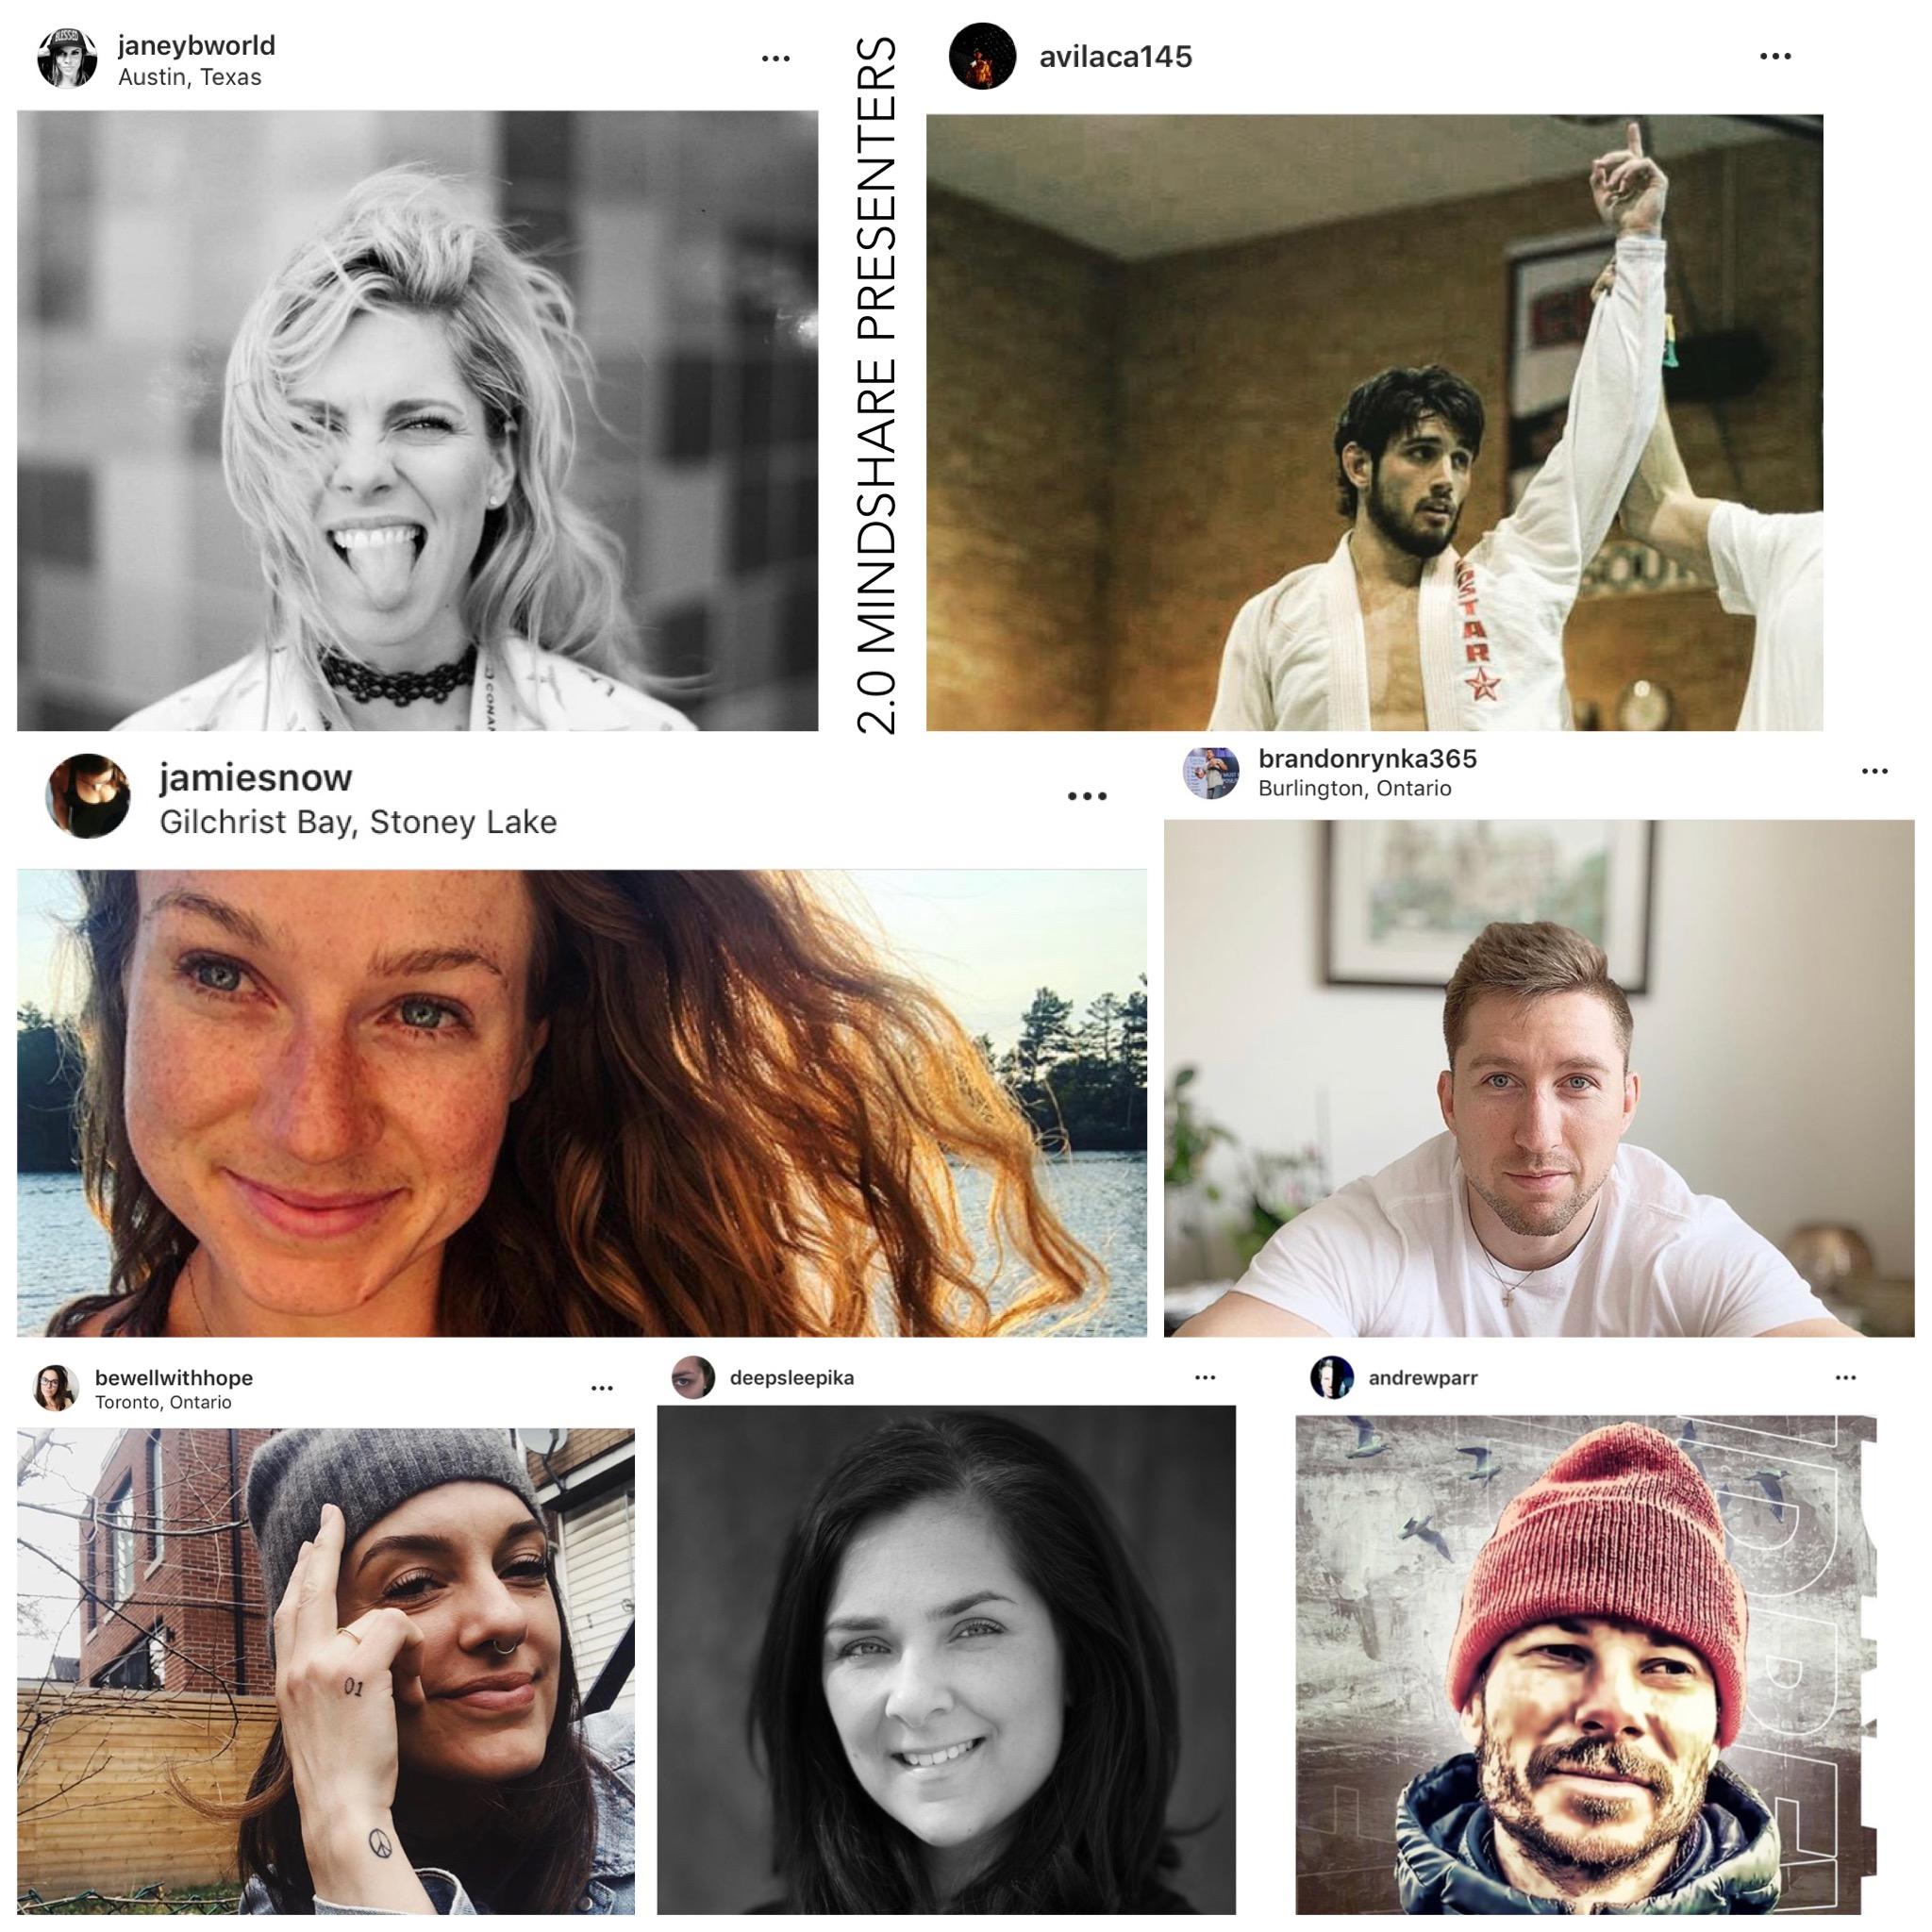 LINEUP OF PRESENTERS  -  Adrian Vilaca  (MMA Fighter & Entrepreneur),  Deepika Malik  (Digital Experience Guru),  Cassandra Hope  (Nutritional Therapist),  Andrew Parr  (Coach & Pro Golfer),  Brandon Rynka  (Motivational Coach),  Janey Brown  (Coach & Performer)